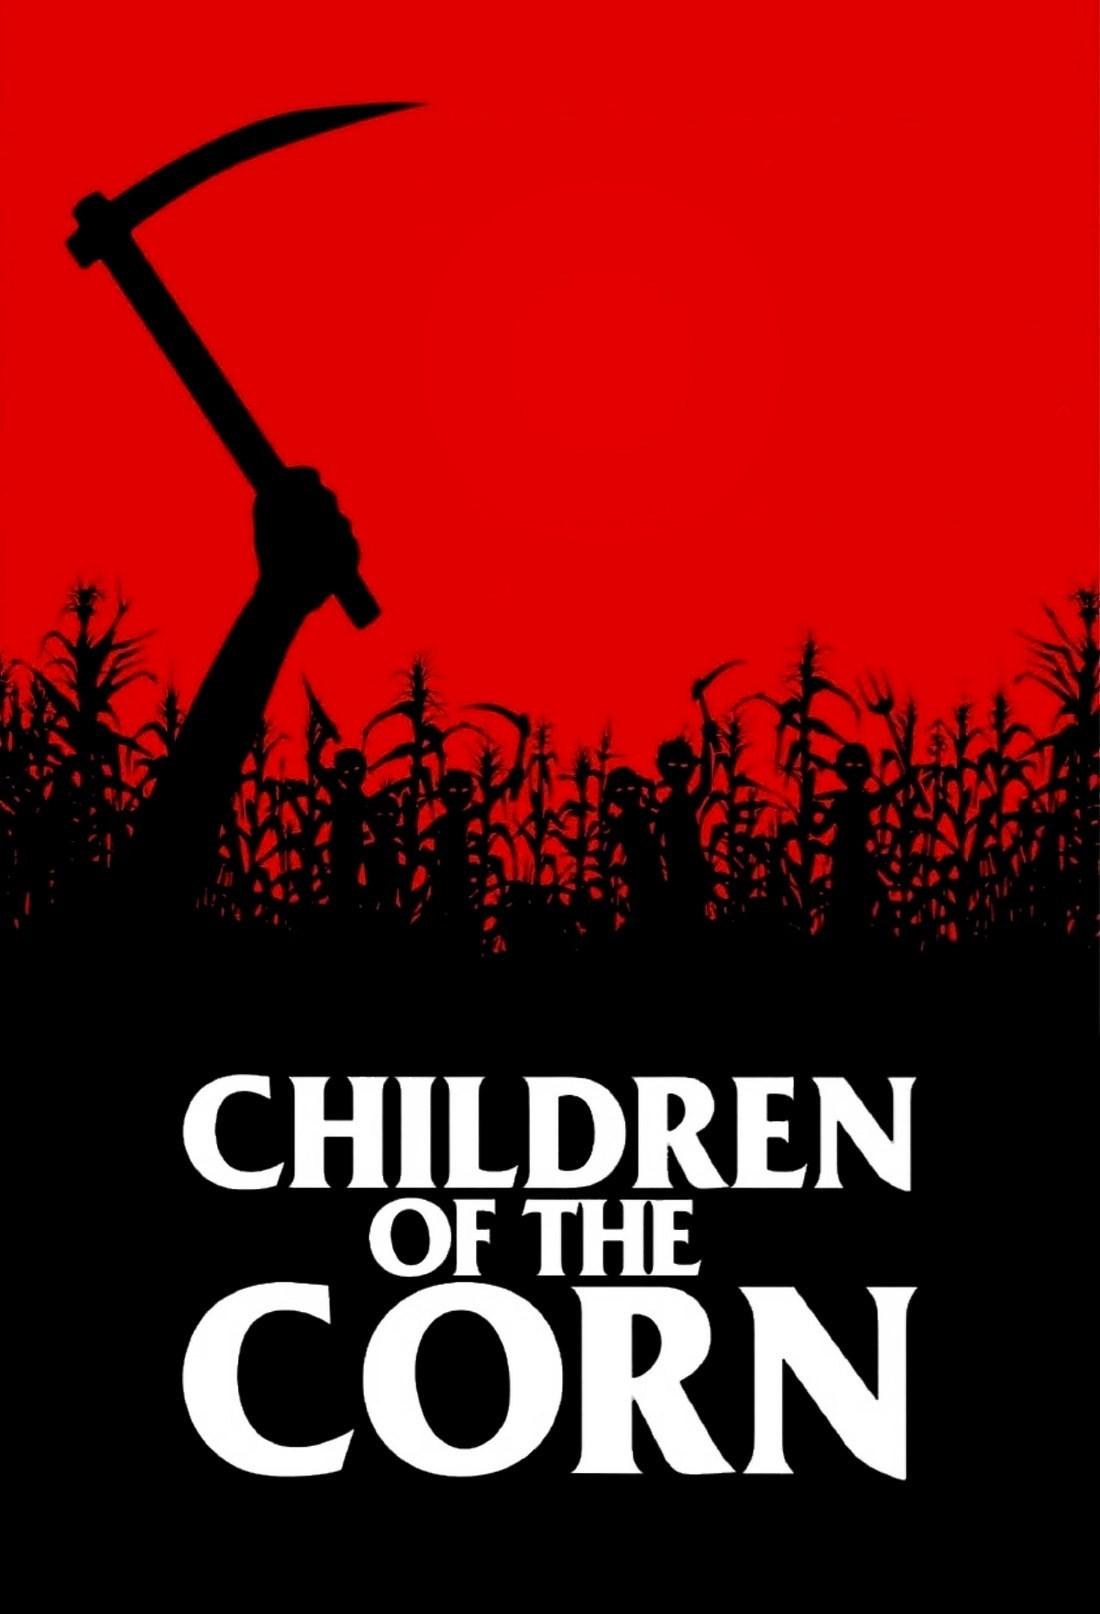 children-of-the-corn.26673.jpg